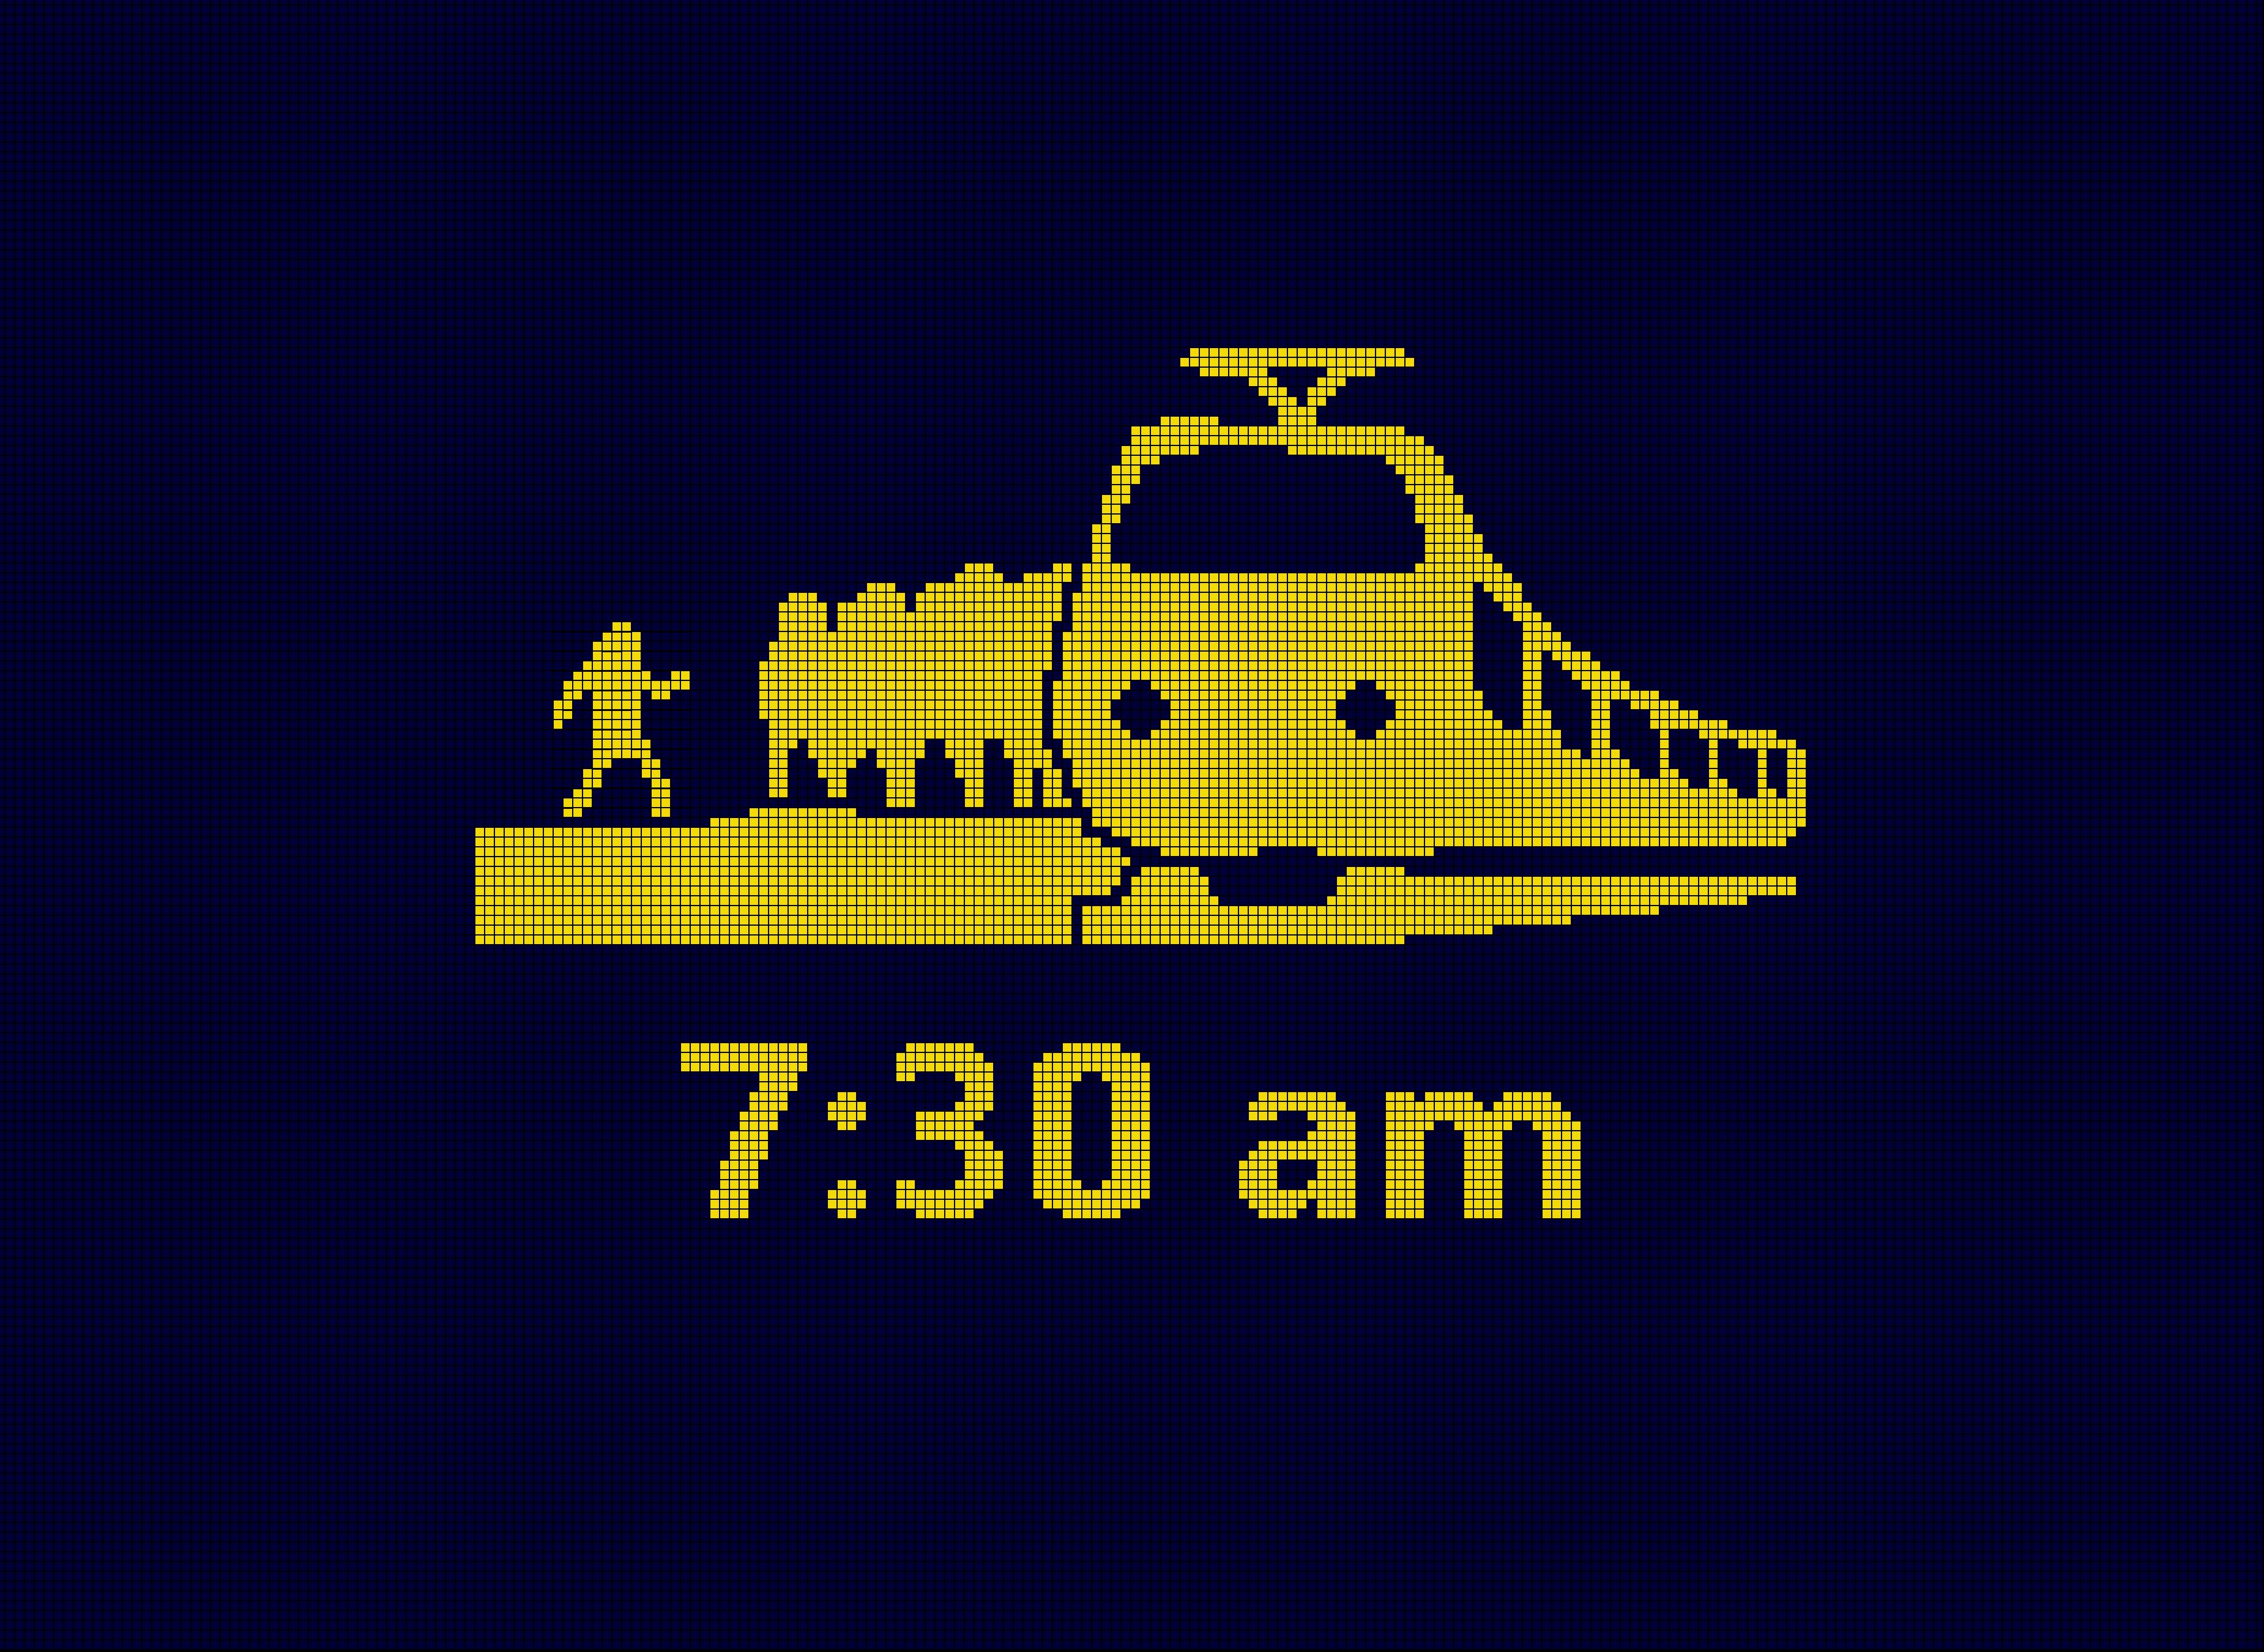 7:30 am